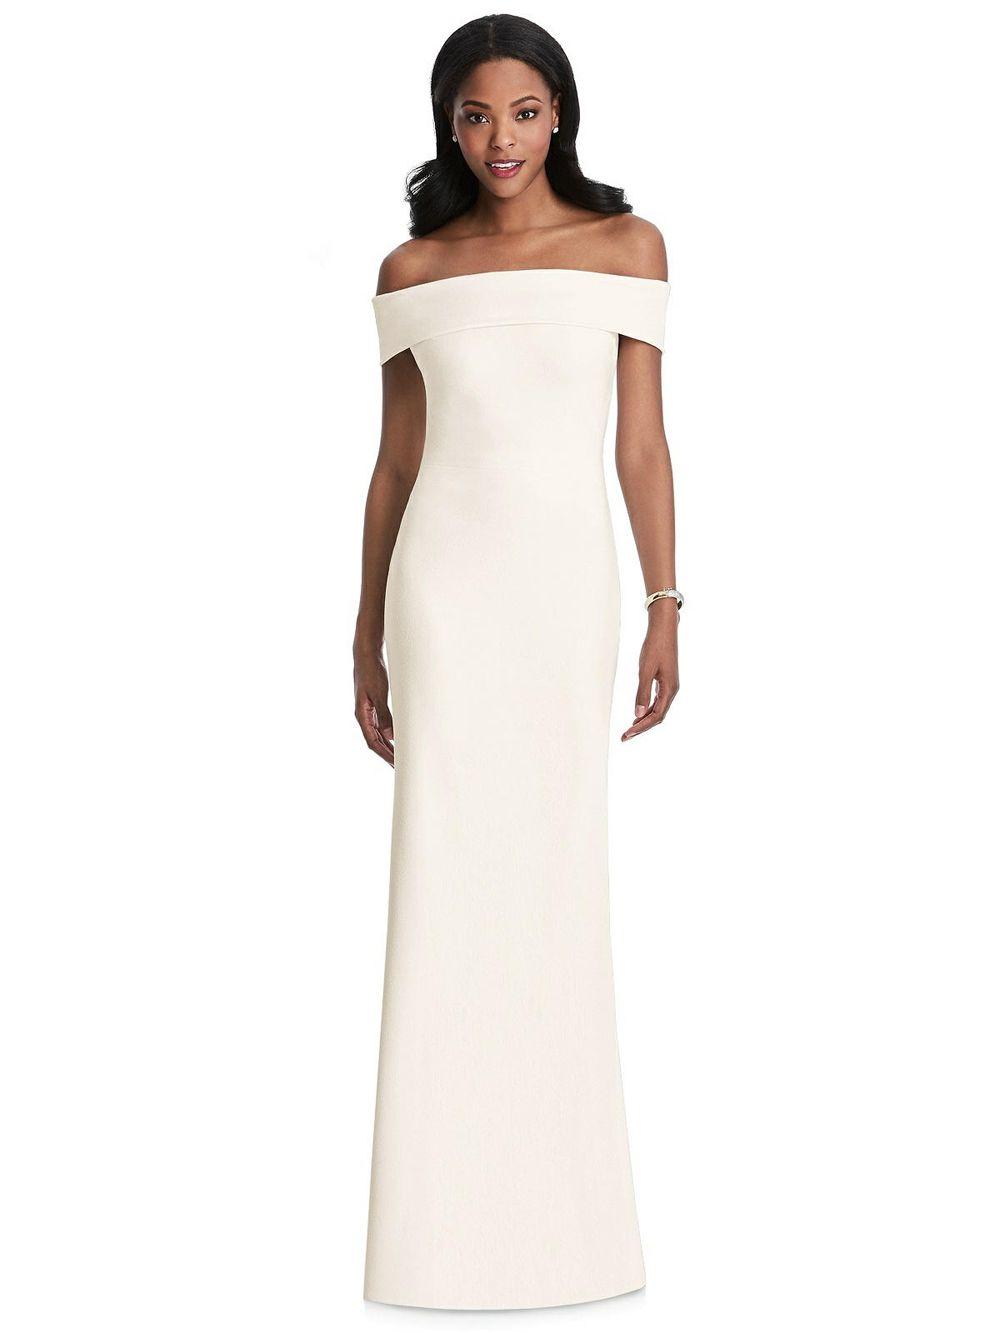 Onyx Bridesmaid Dresses | www.topsimages.com